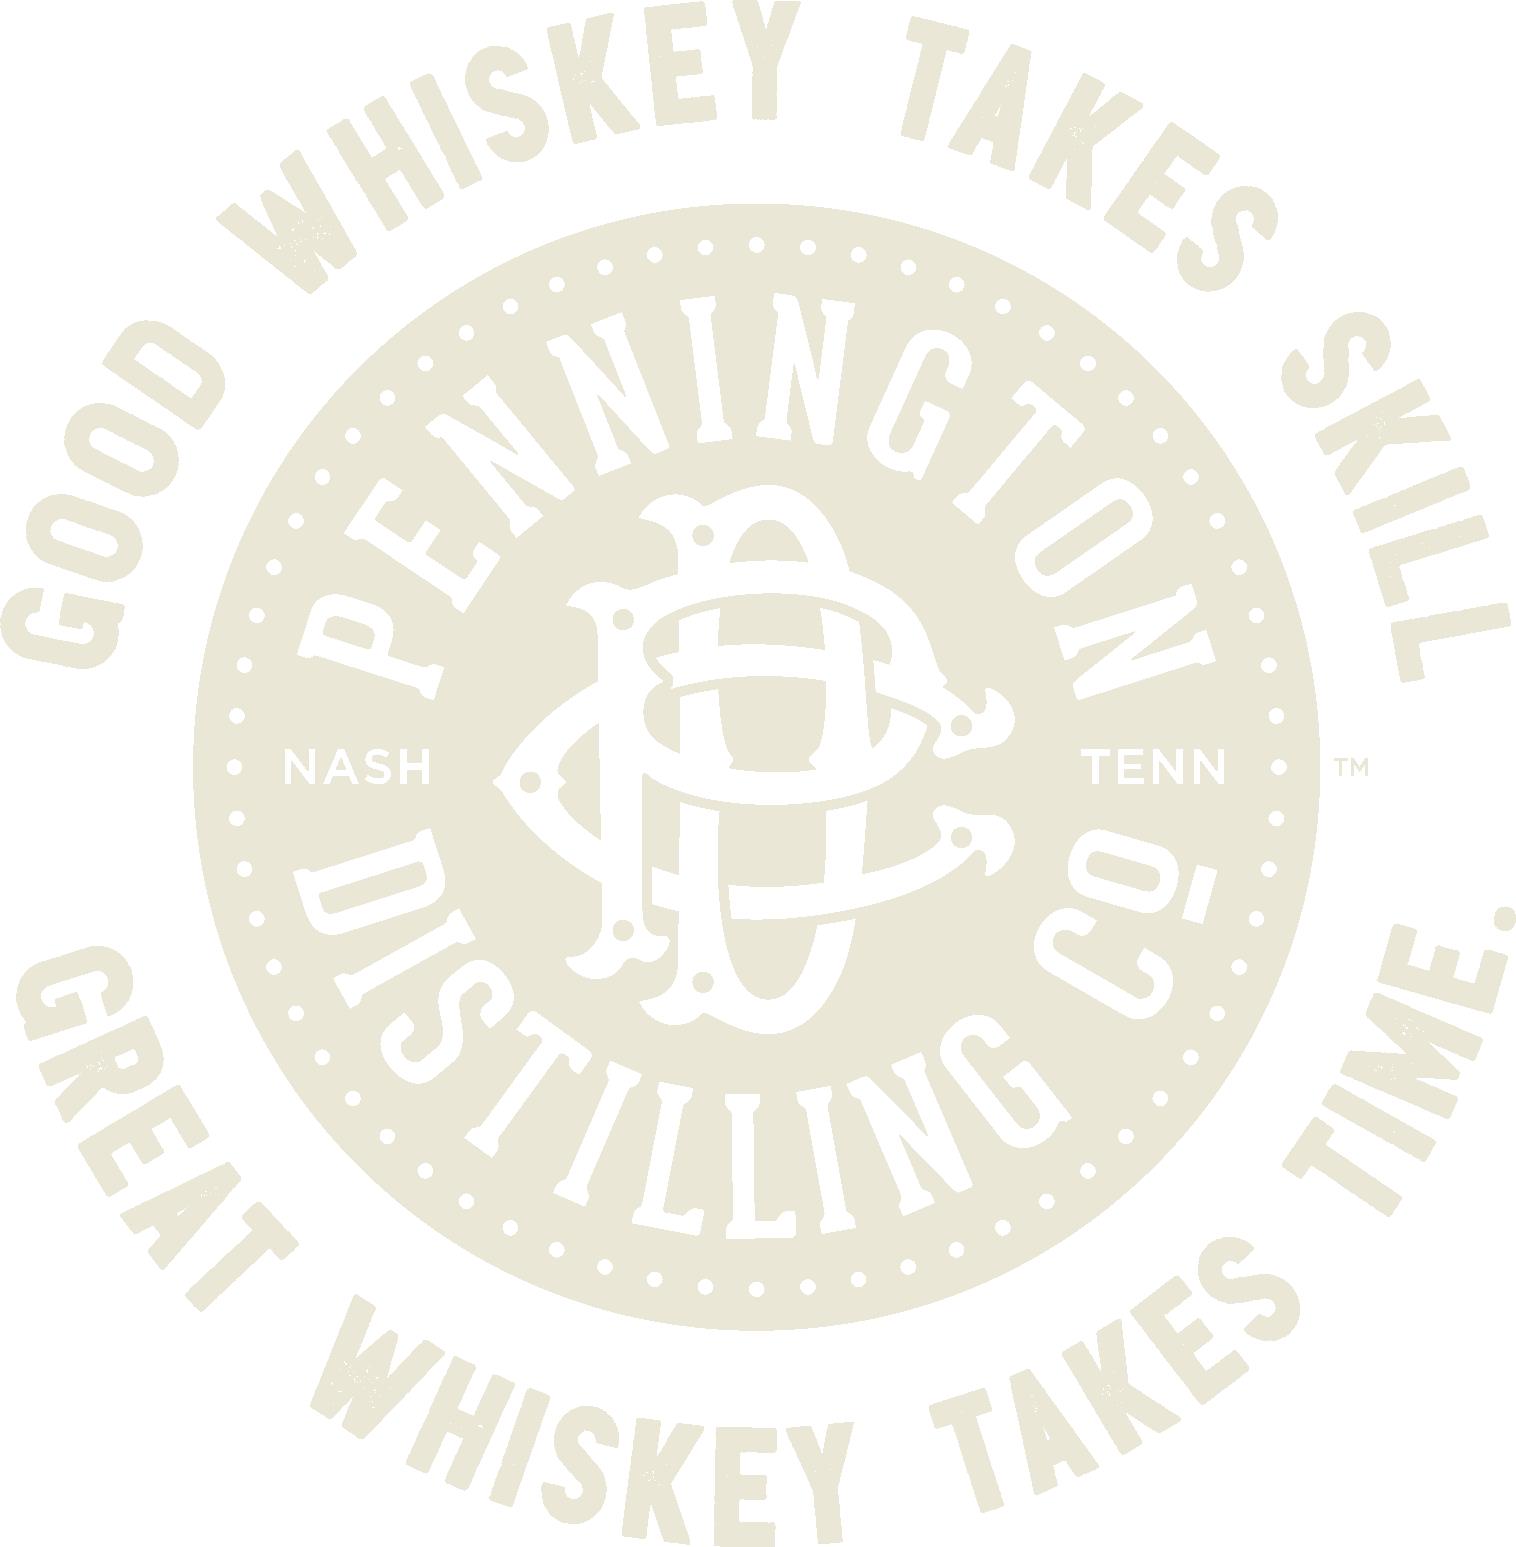 Pennington Distilling Co. | Nashville, TN